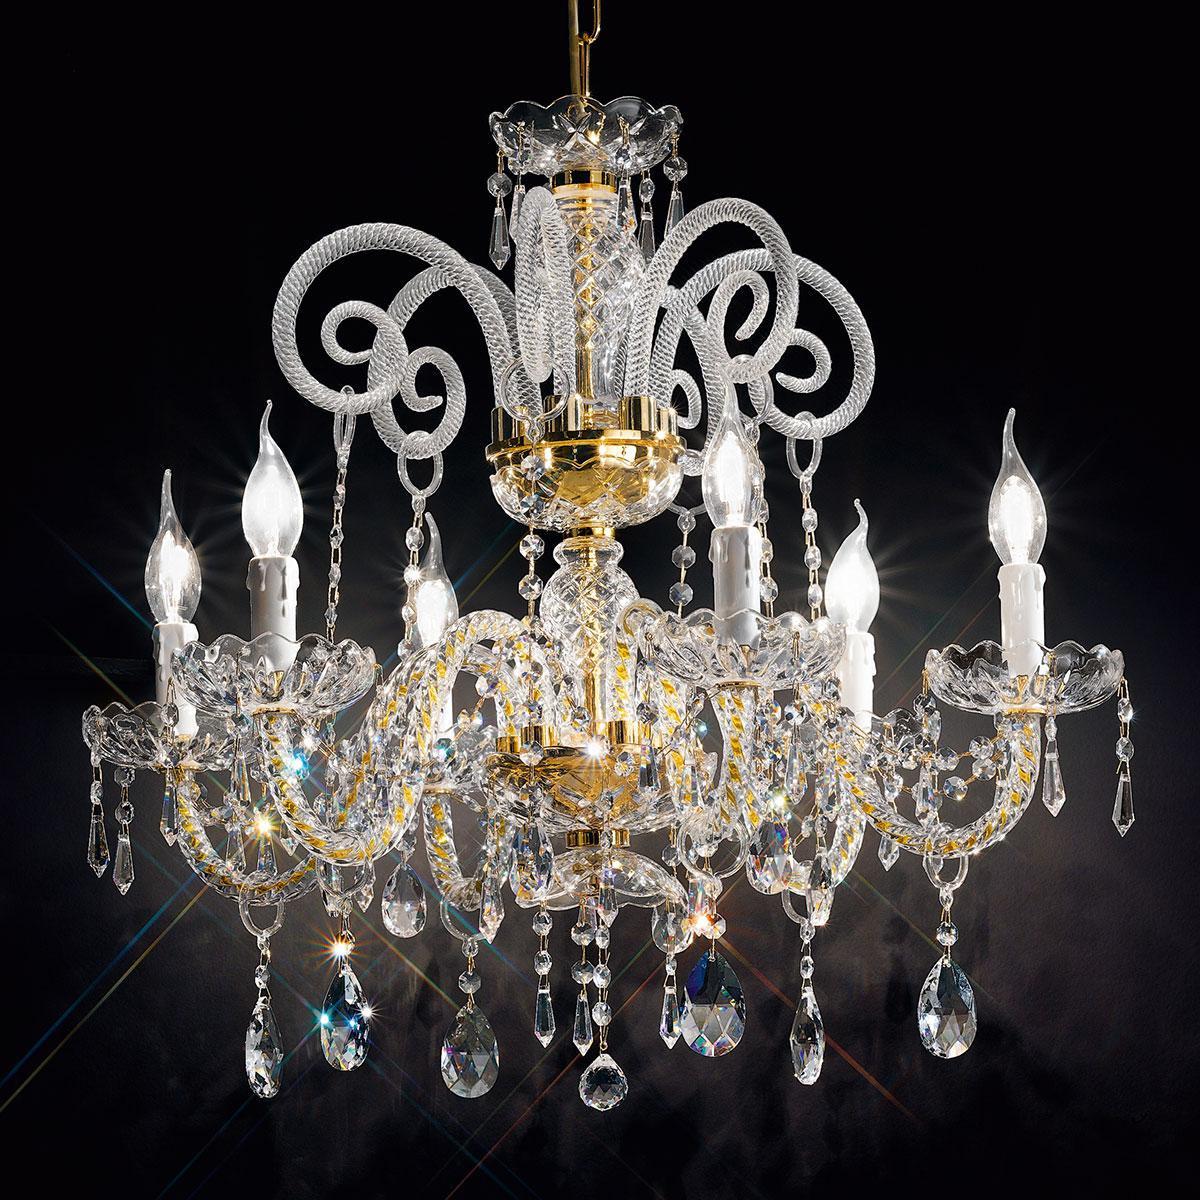 """Signorini"" venezianischer kristall kronleuchter - 6 flammig - transparent mit kristal Asfour"